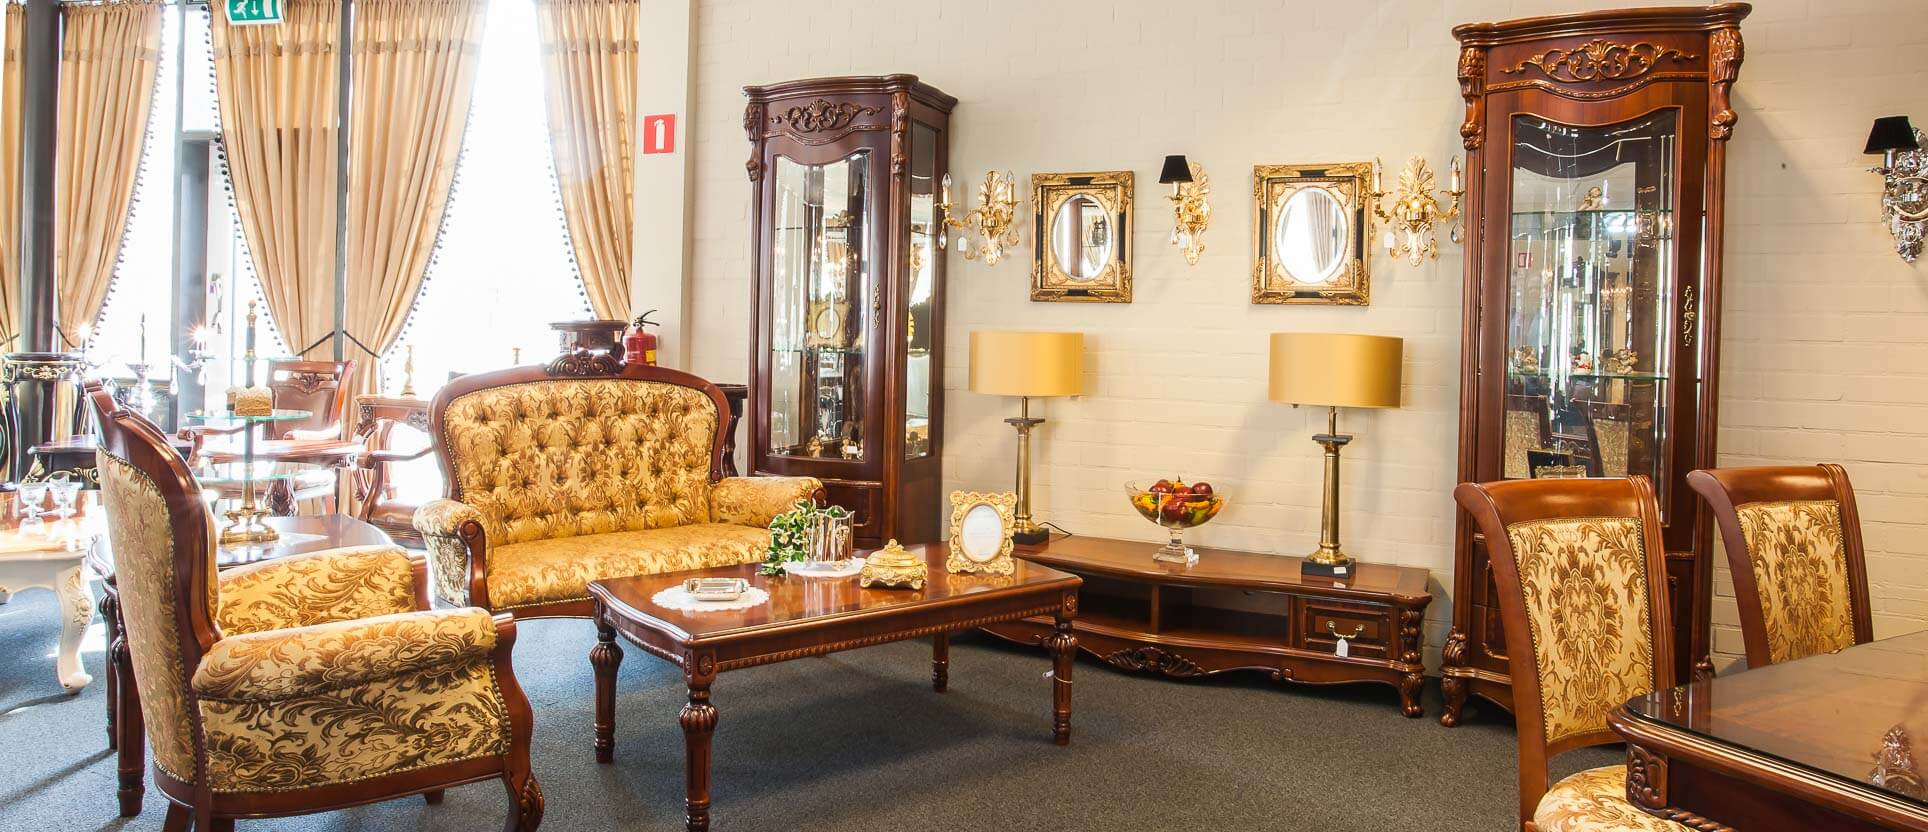 Barokke meubelen